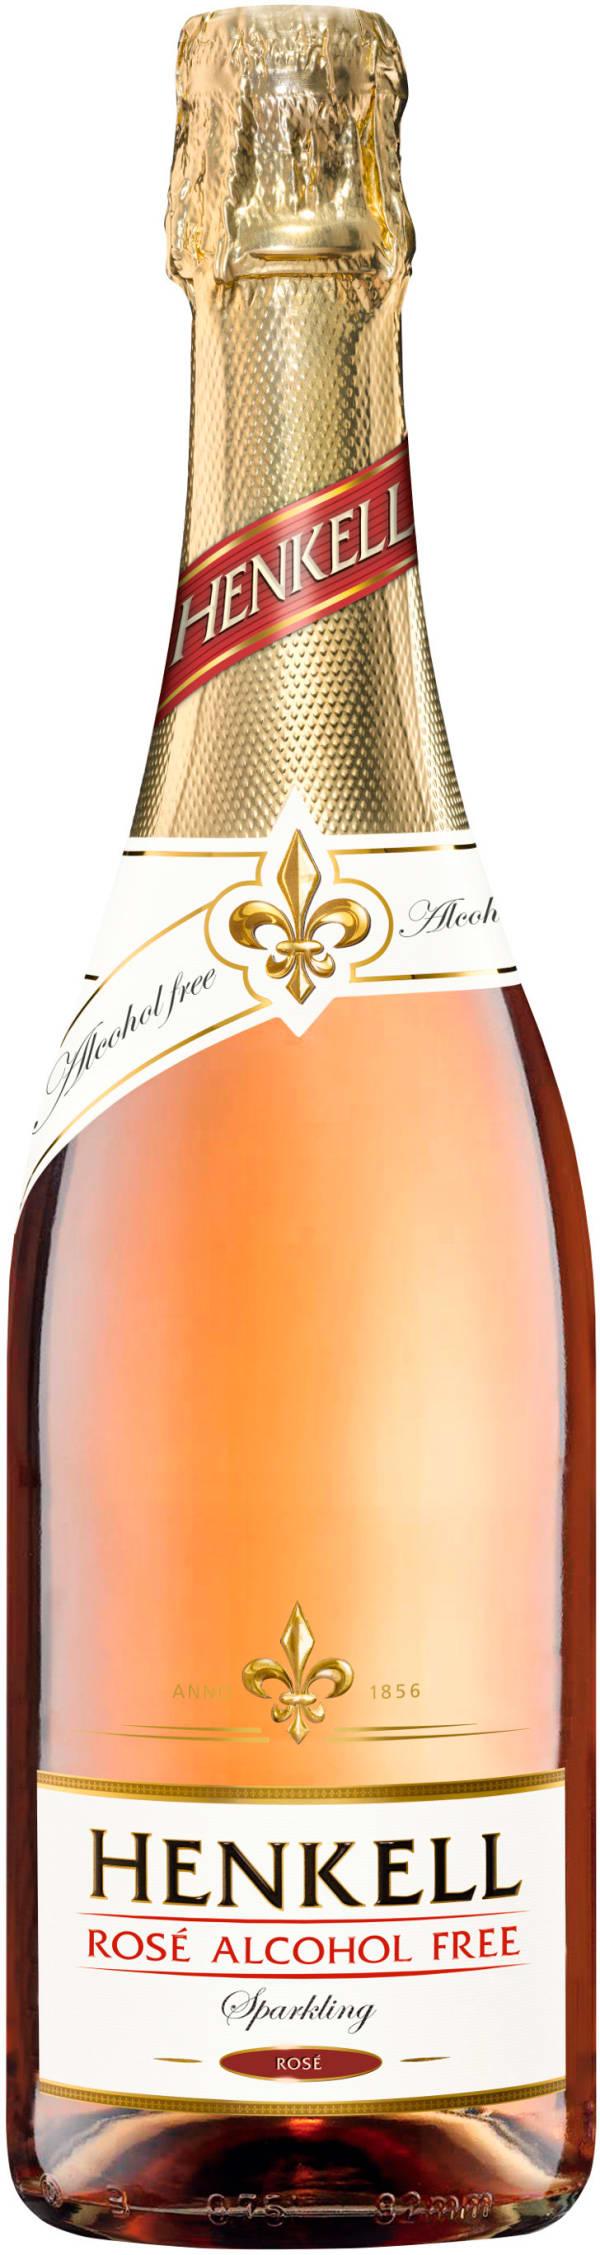 Henkell Sparkling Rosé Alcoholfree